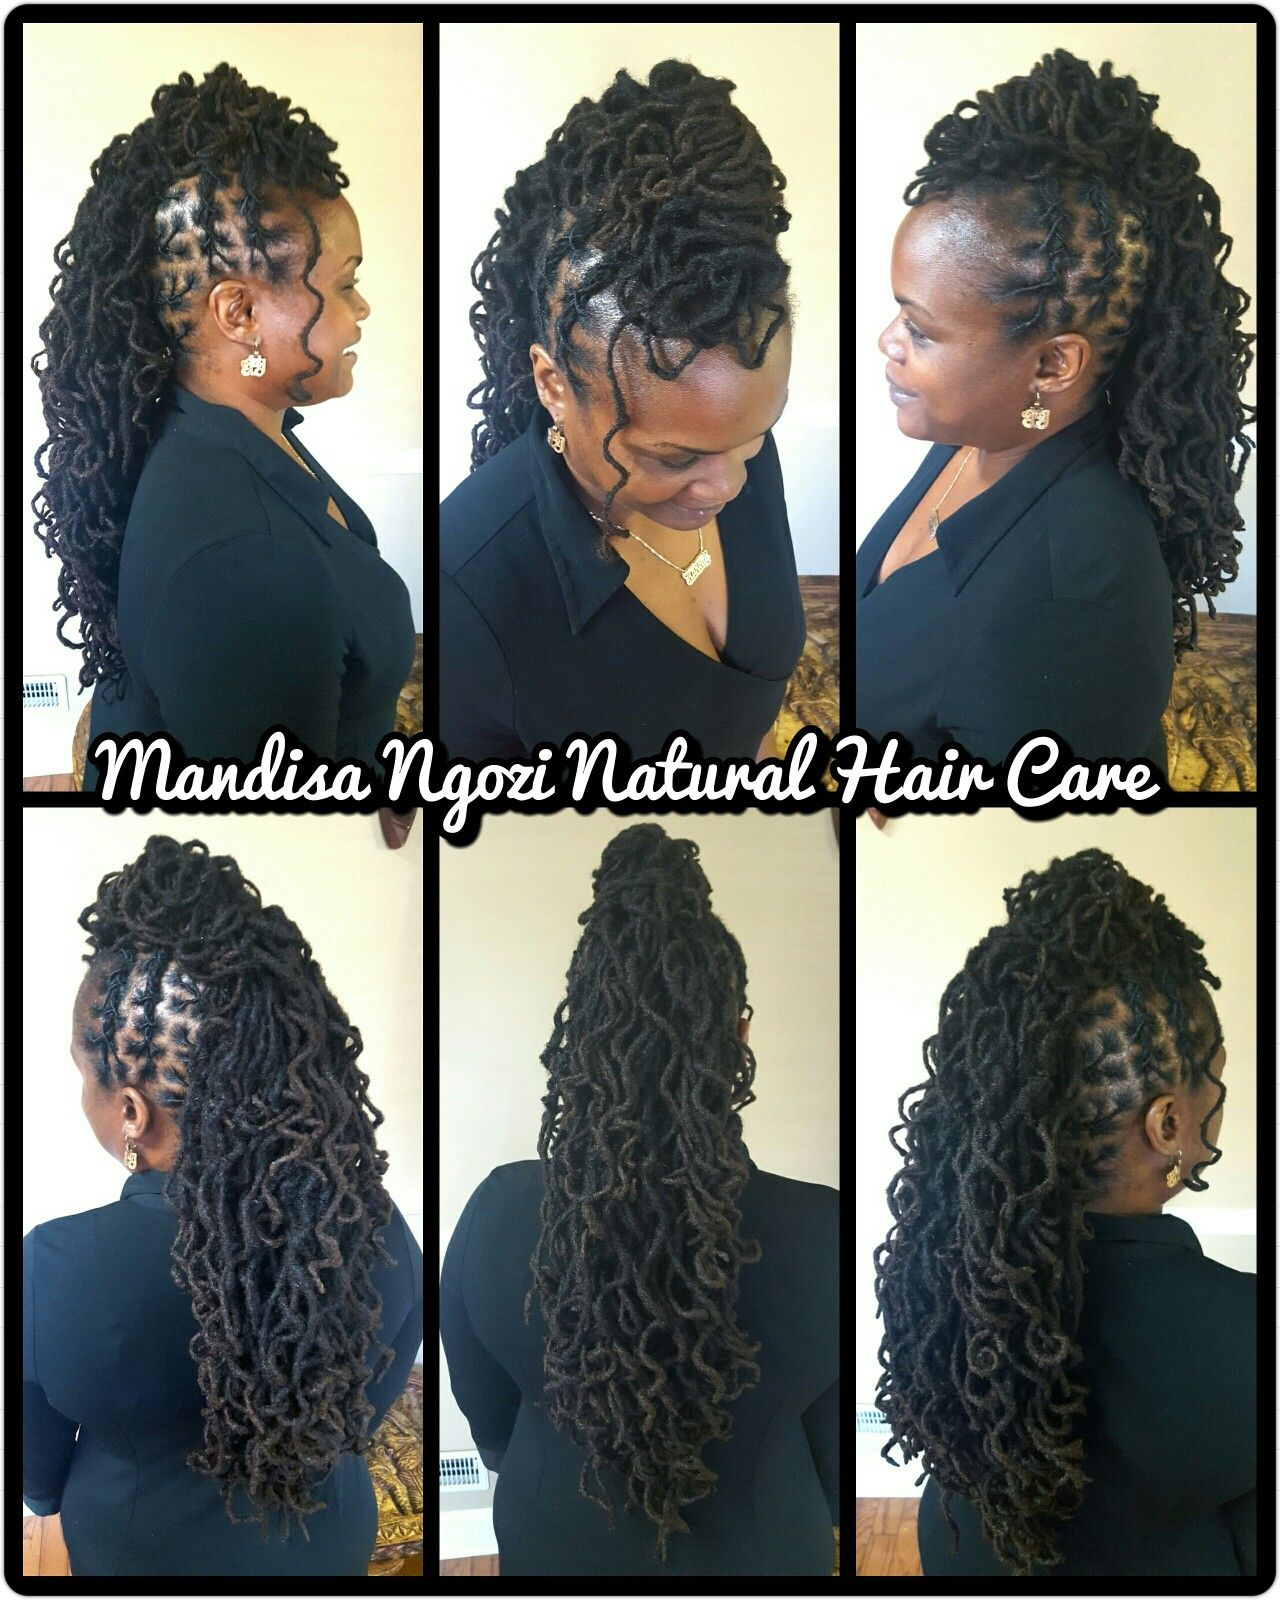 Long Curly Locs By Necijones For Mandisa Ngozi Natural Hair Care